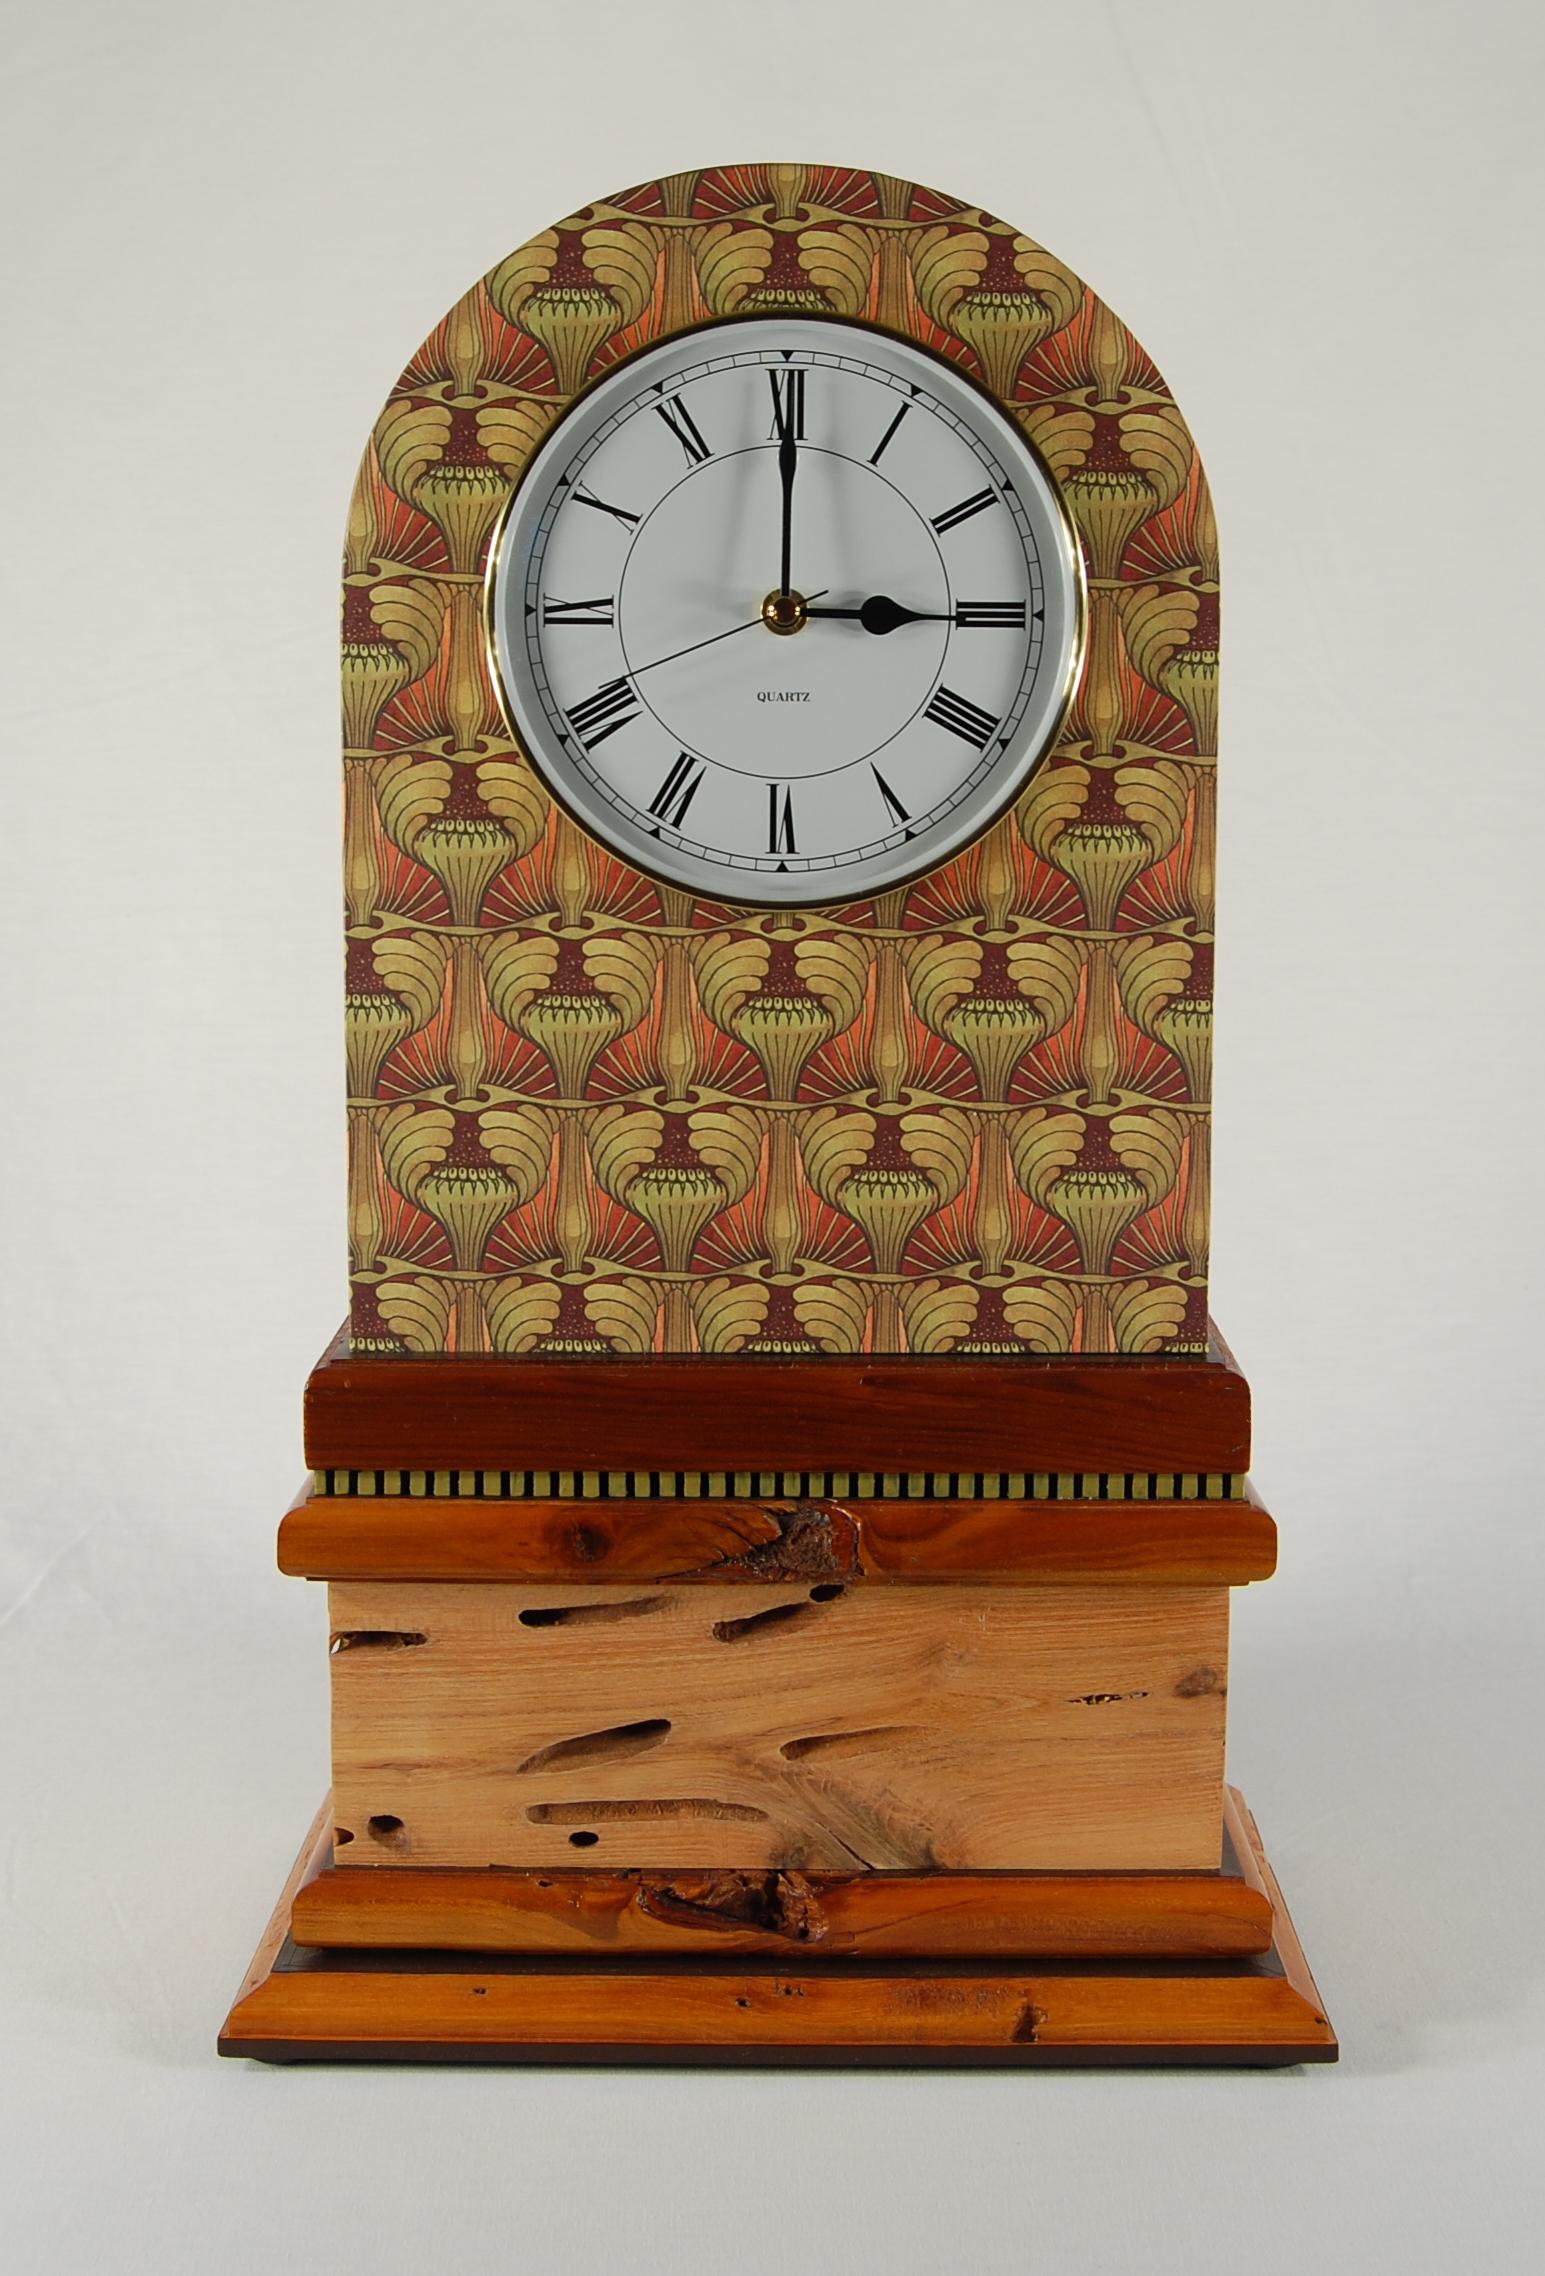 austerity clock #165